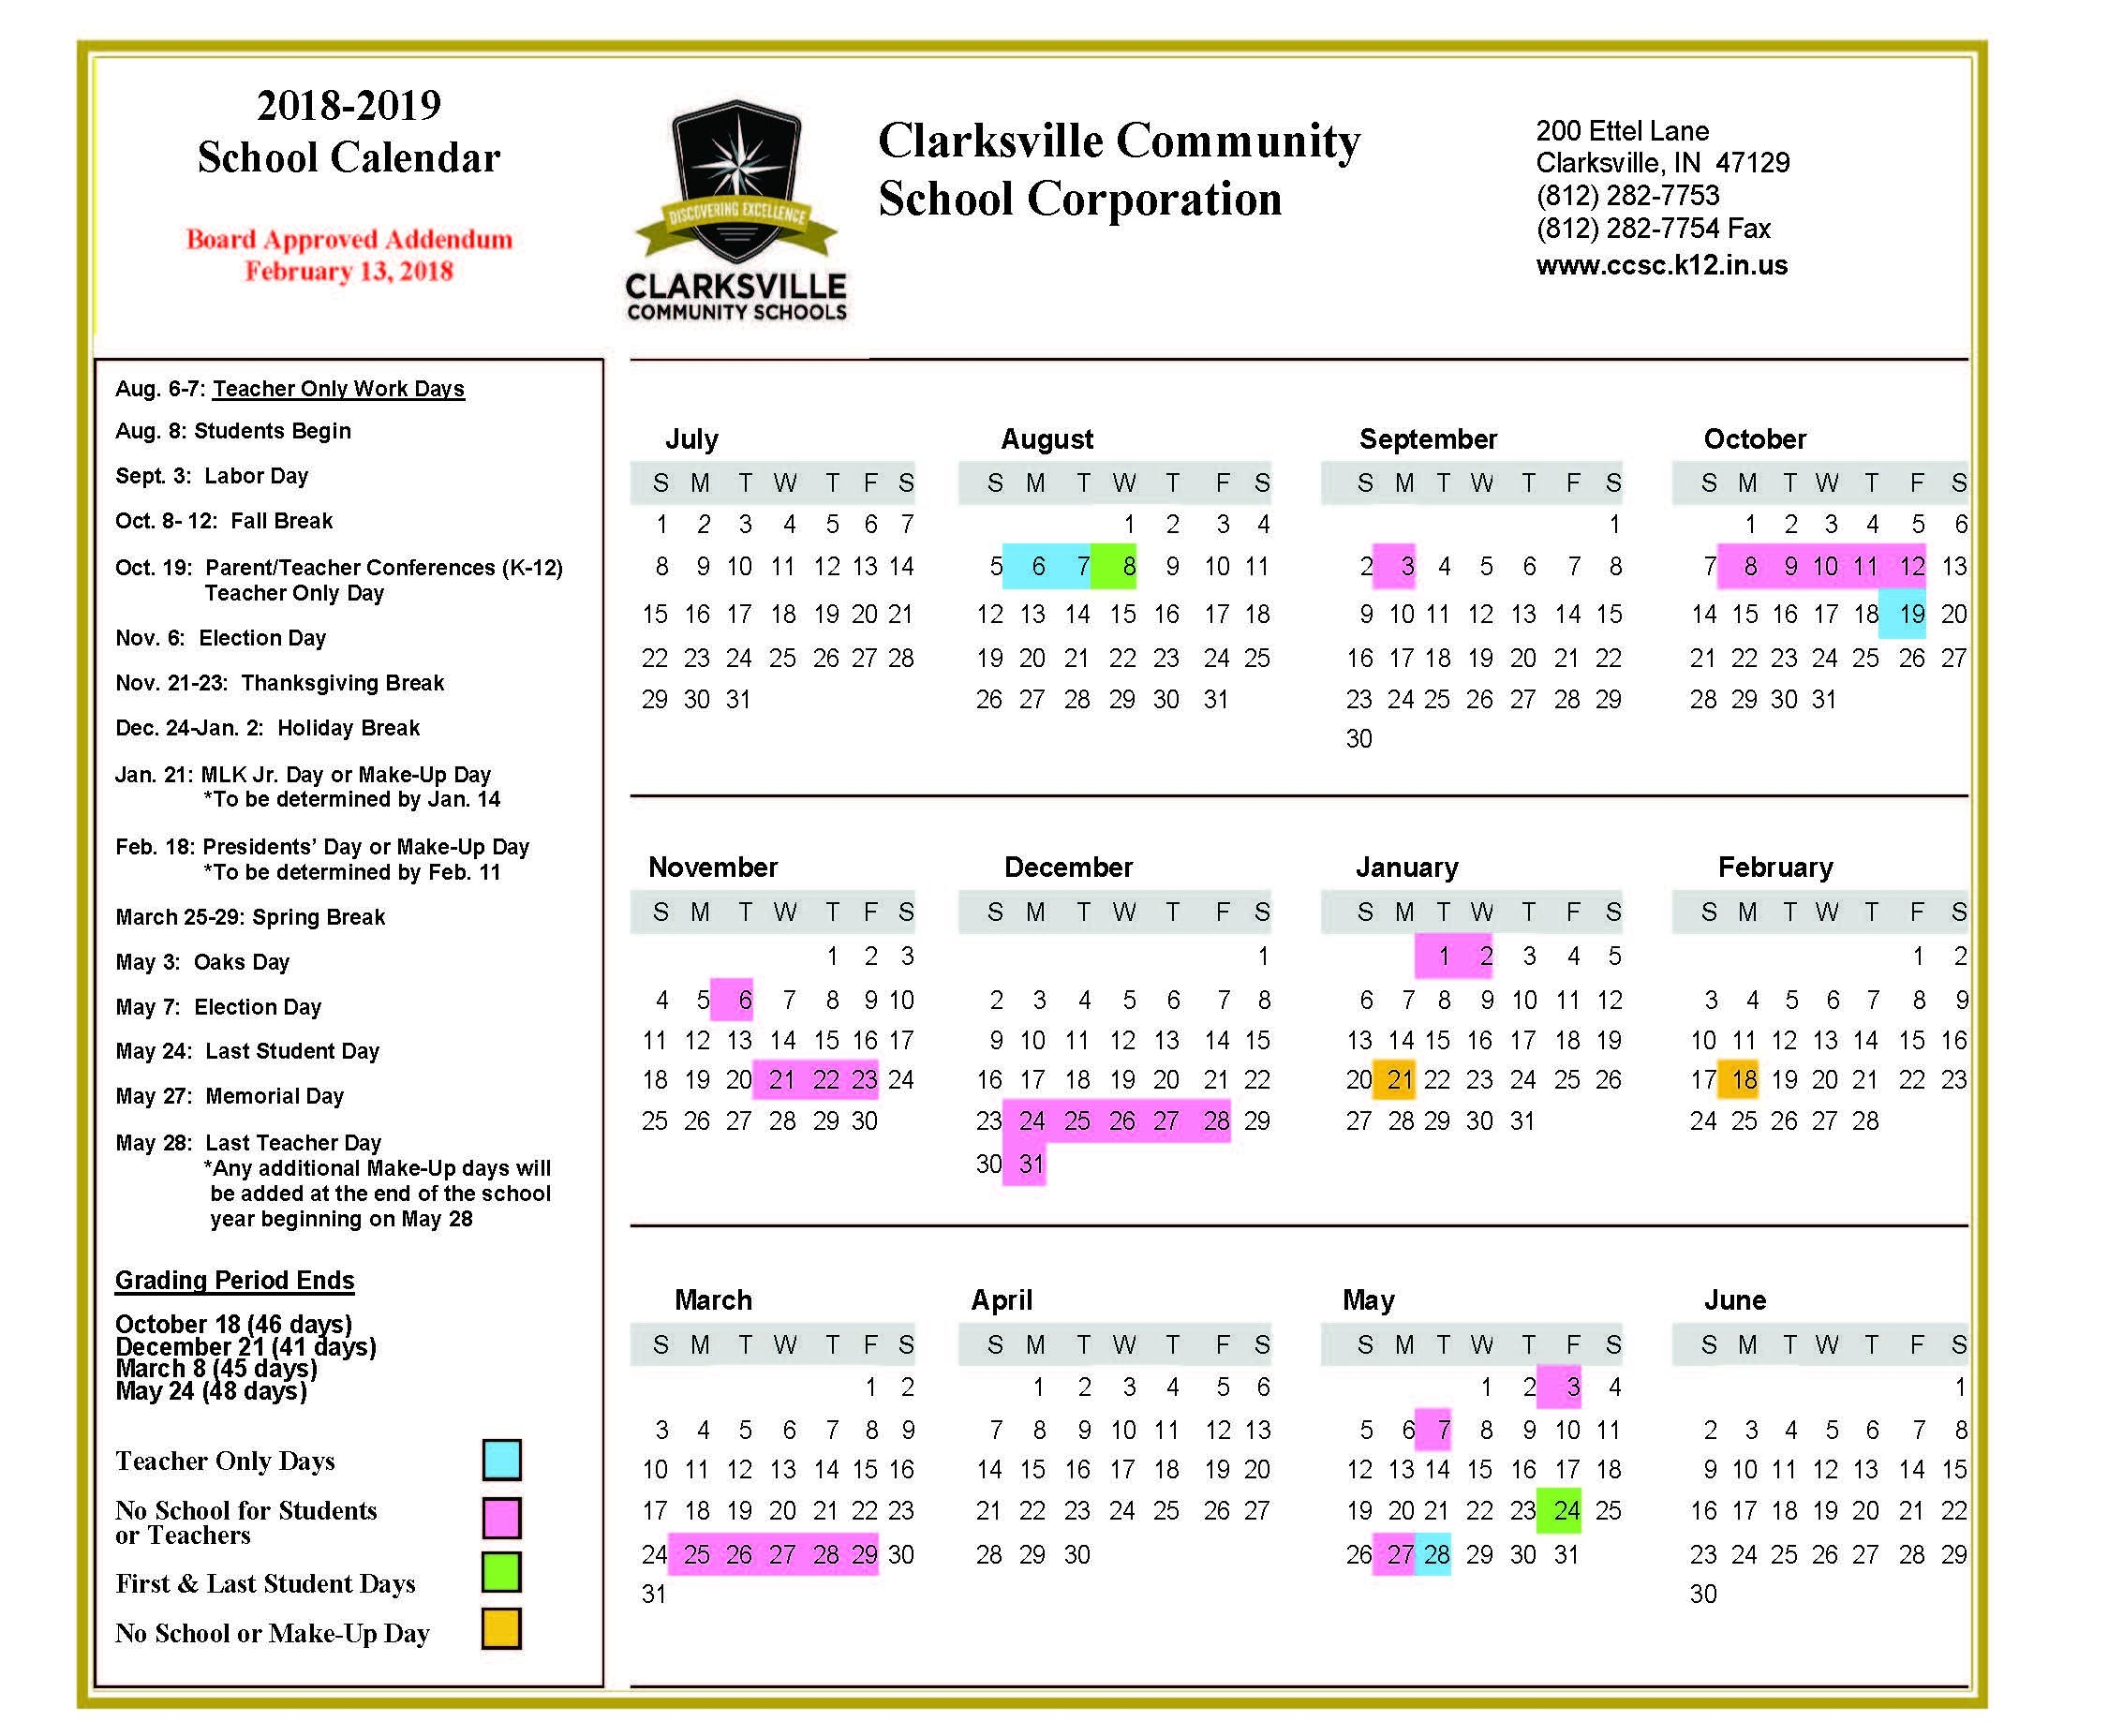 2018-2019 School Calendar Approvedboard | Clarksville Community School Calendar 2019-20